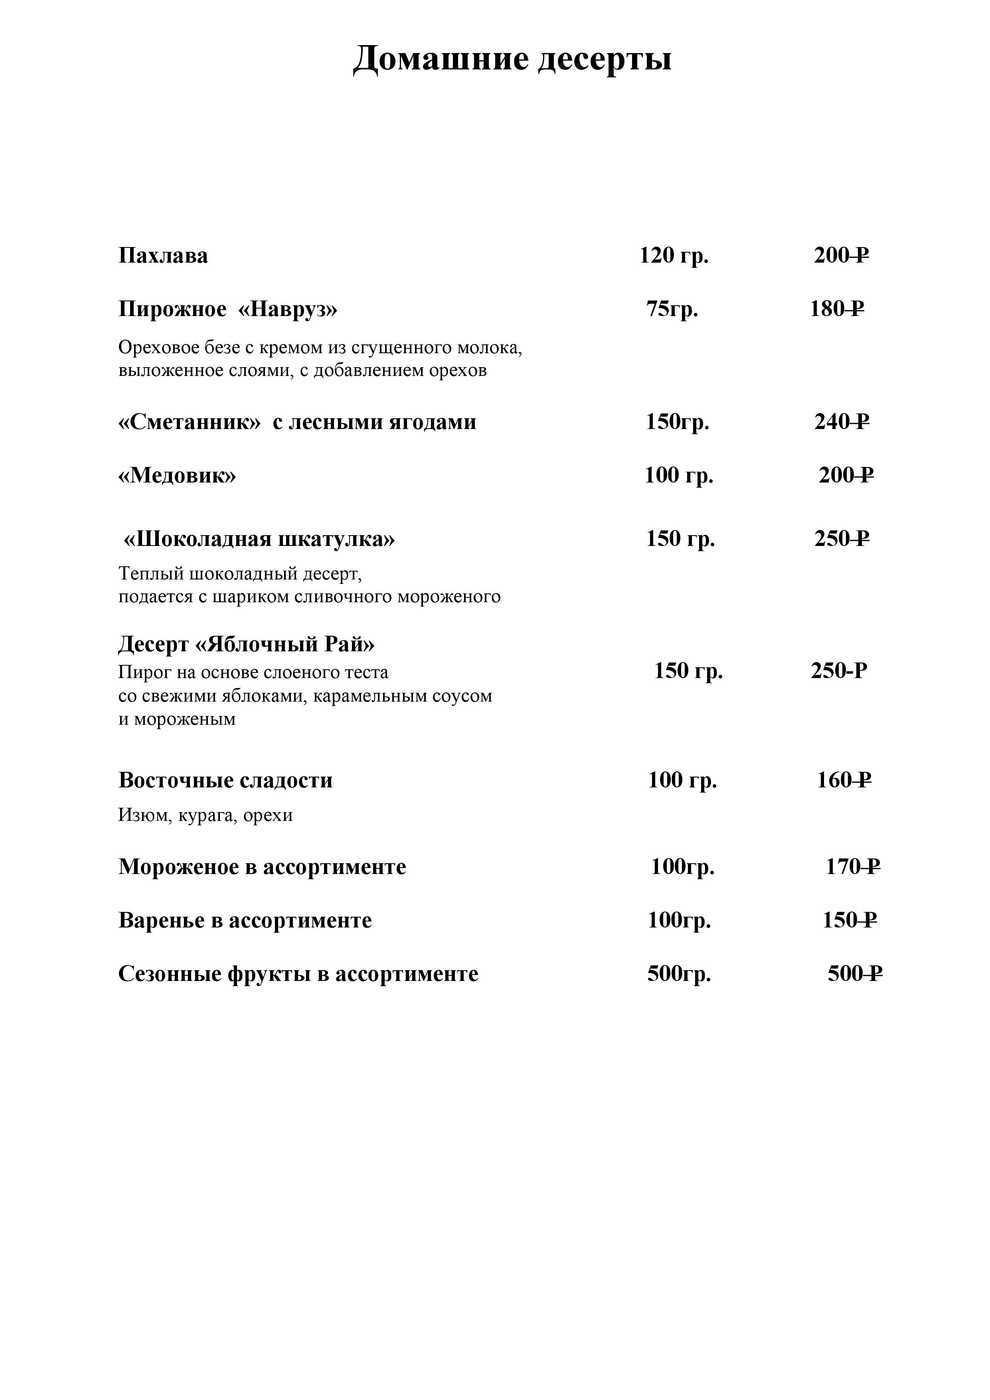 Меню ресторана Навруз на Ленинском проспекте фото 10